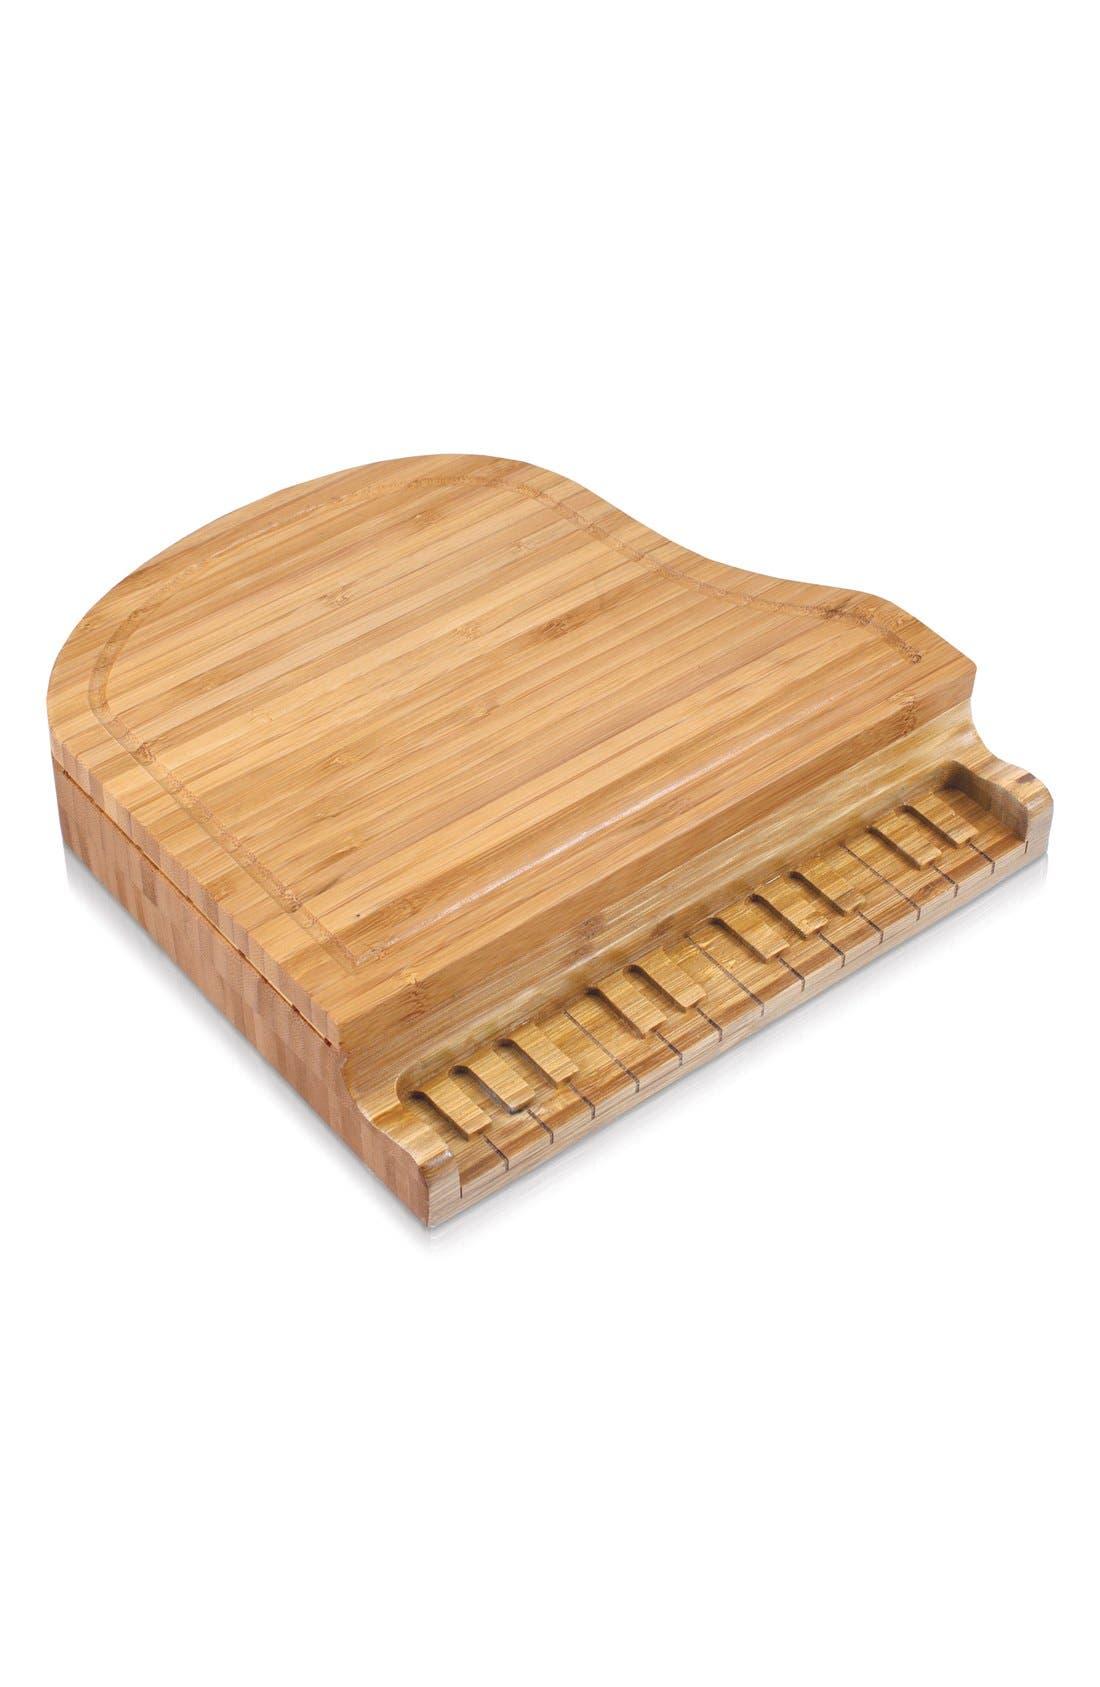 Alternate Image 3  - Picnic Time 'Piano' Cheese Board Set